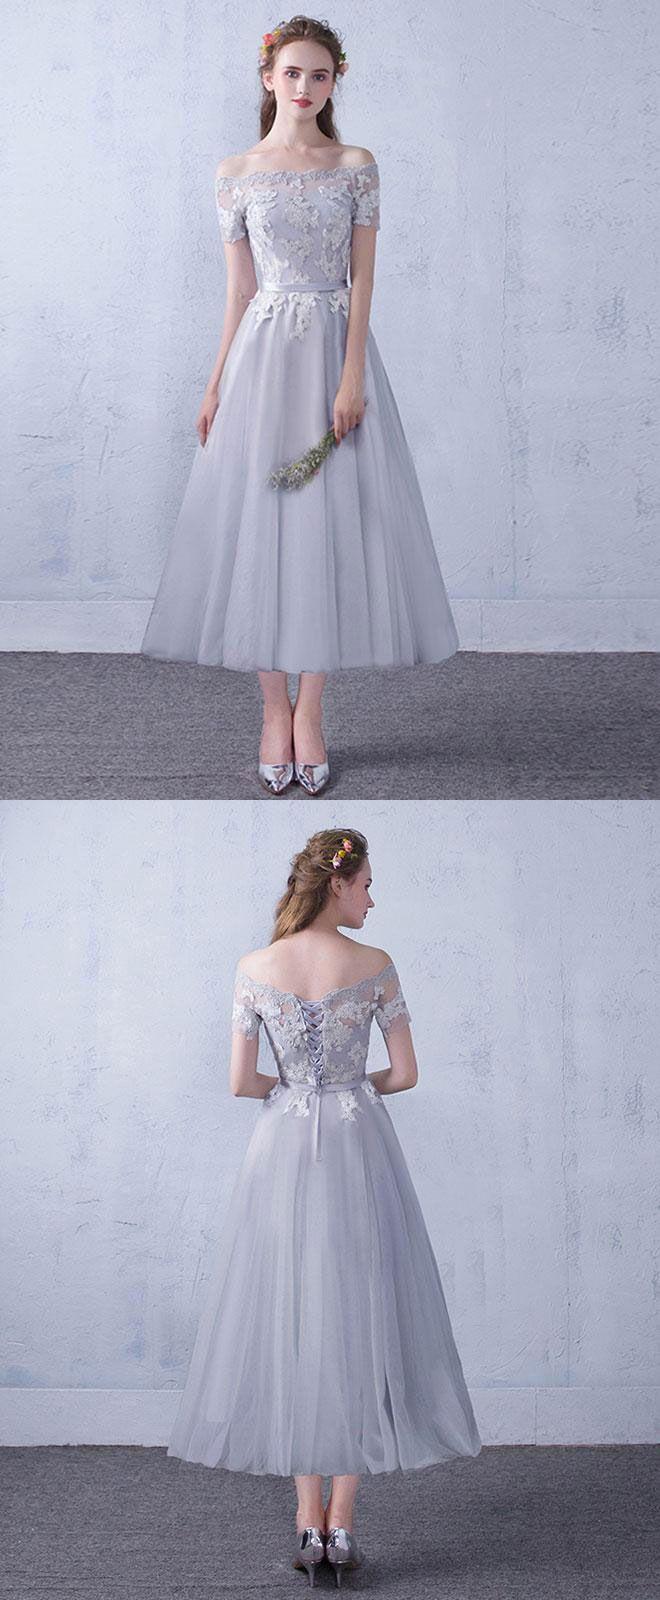 Gray tulle lace tea length prom dress gray bridesmaid dress